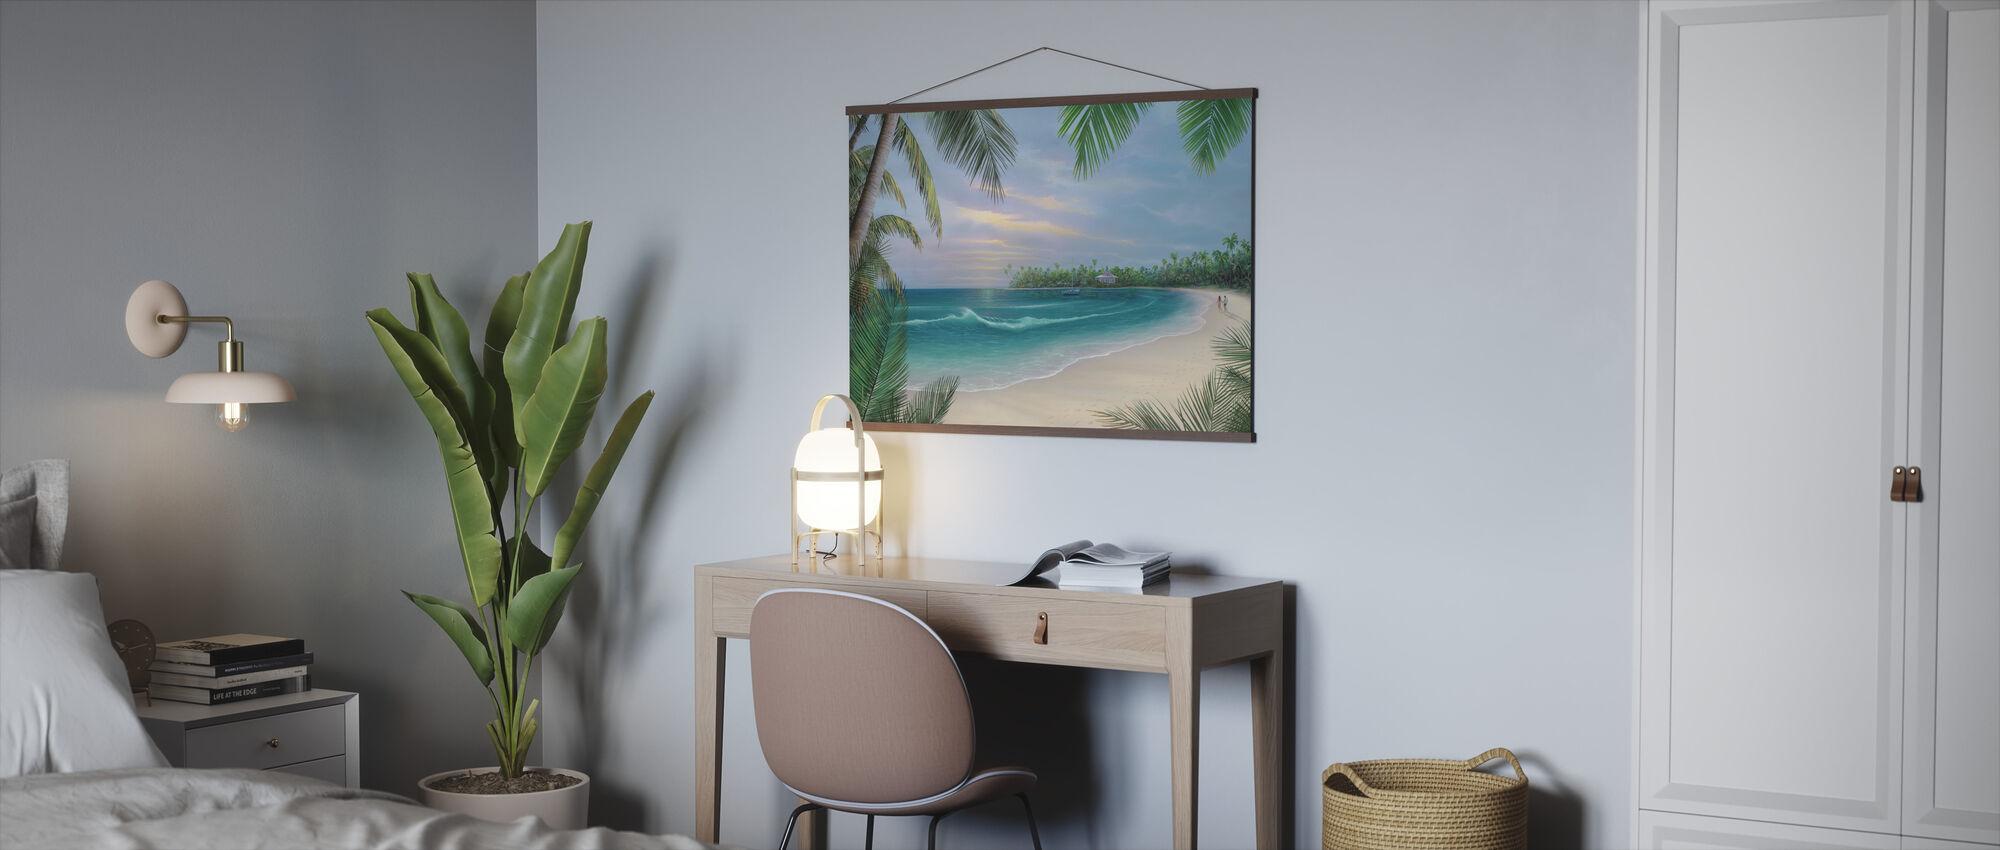 Beach House Rendezvous - Poster - Kantoor